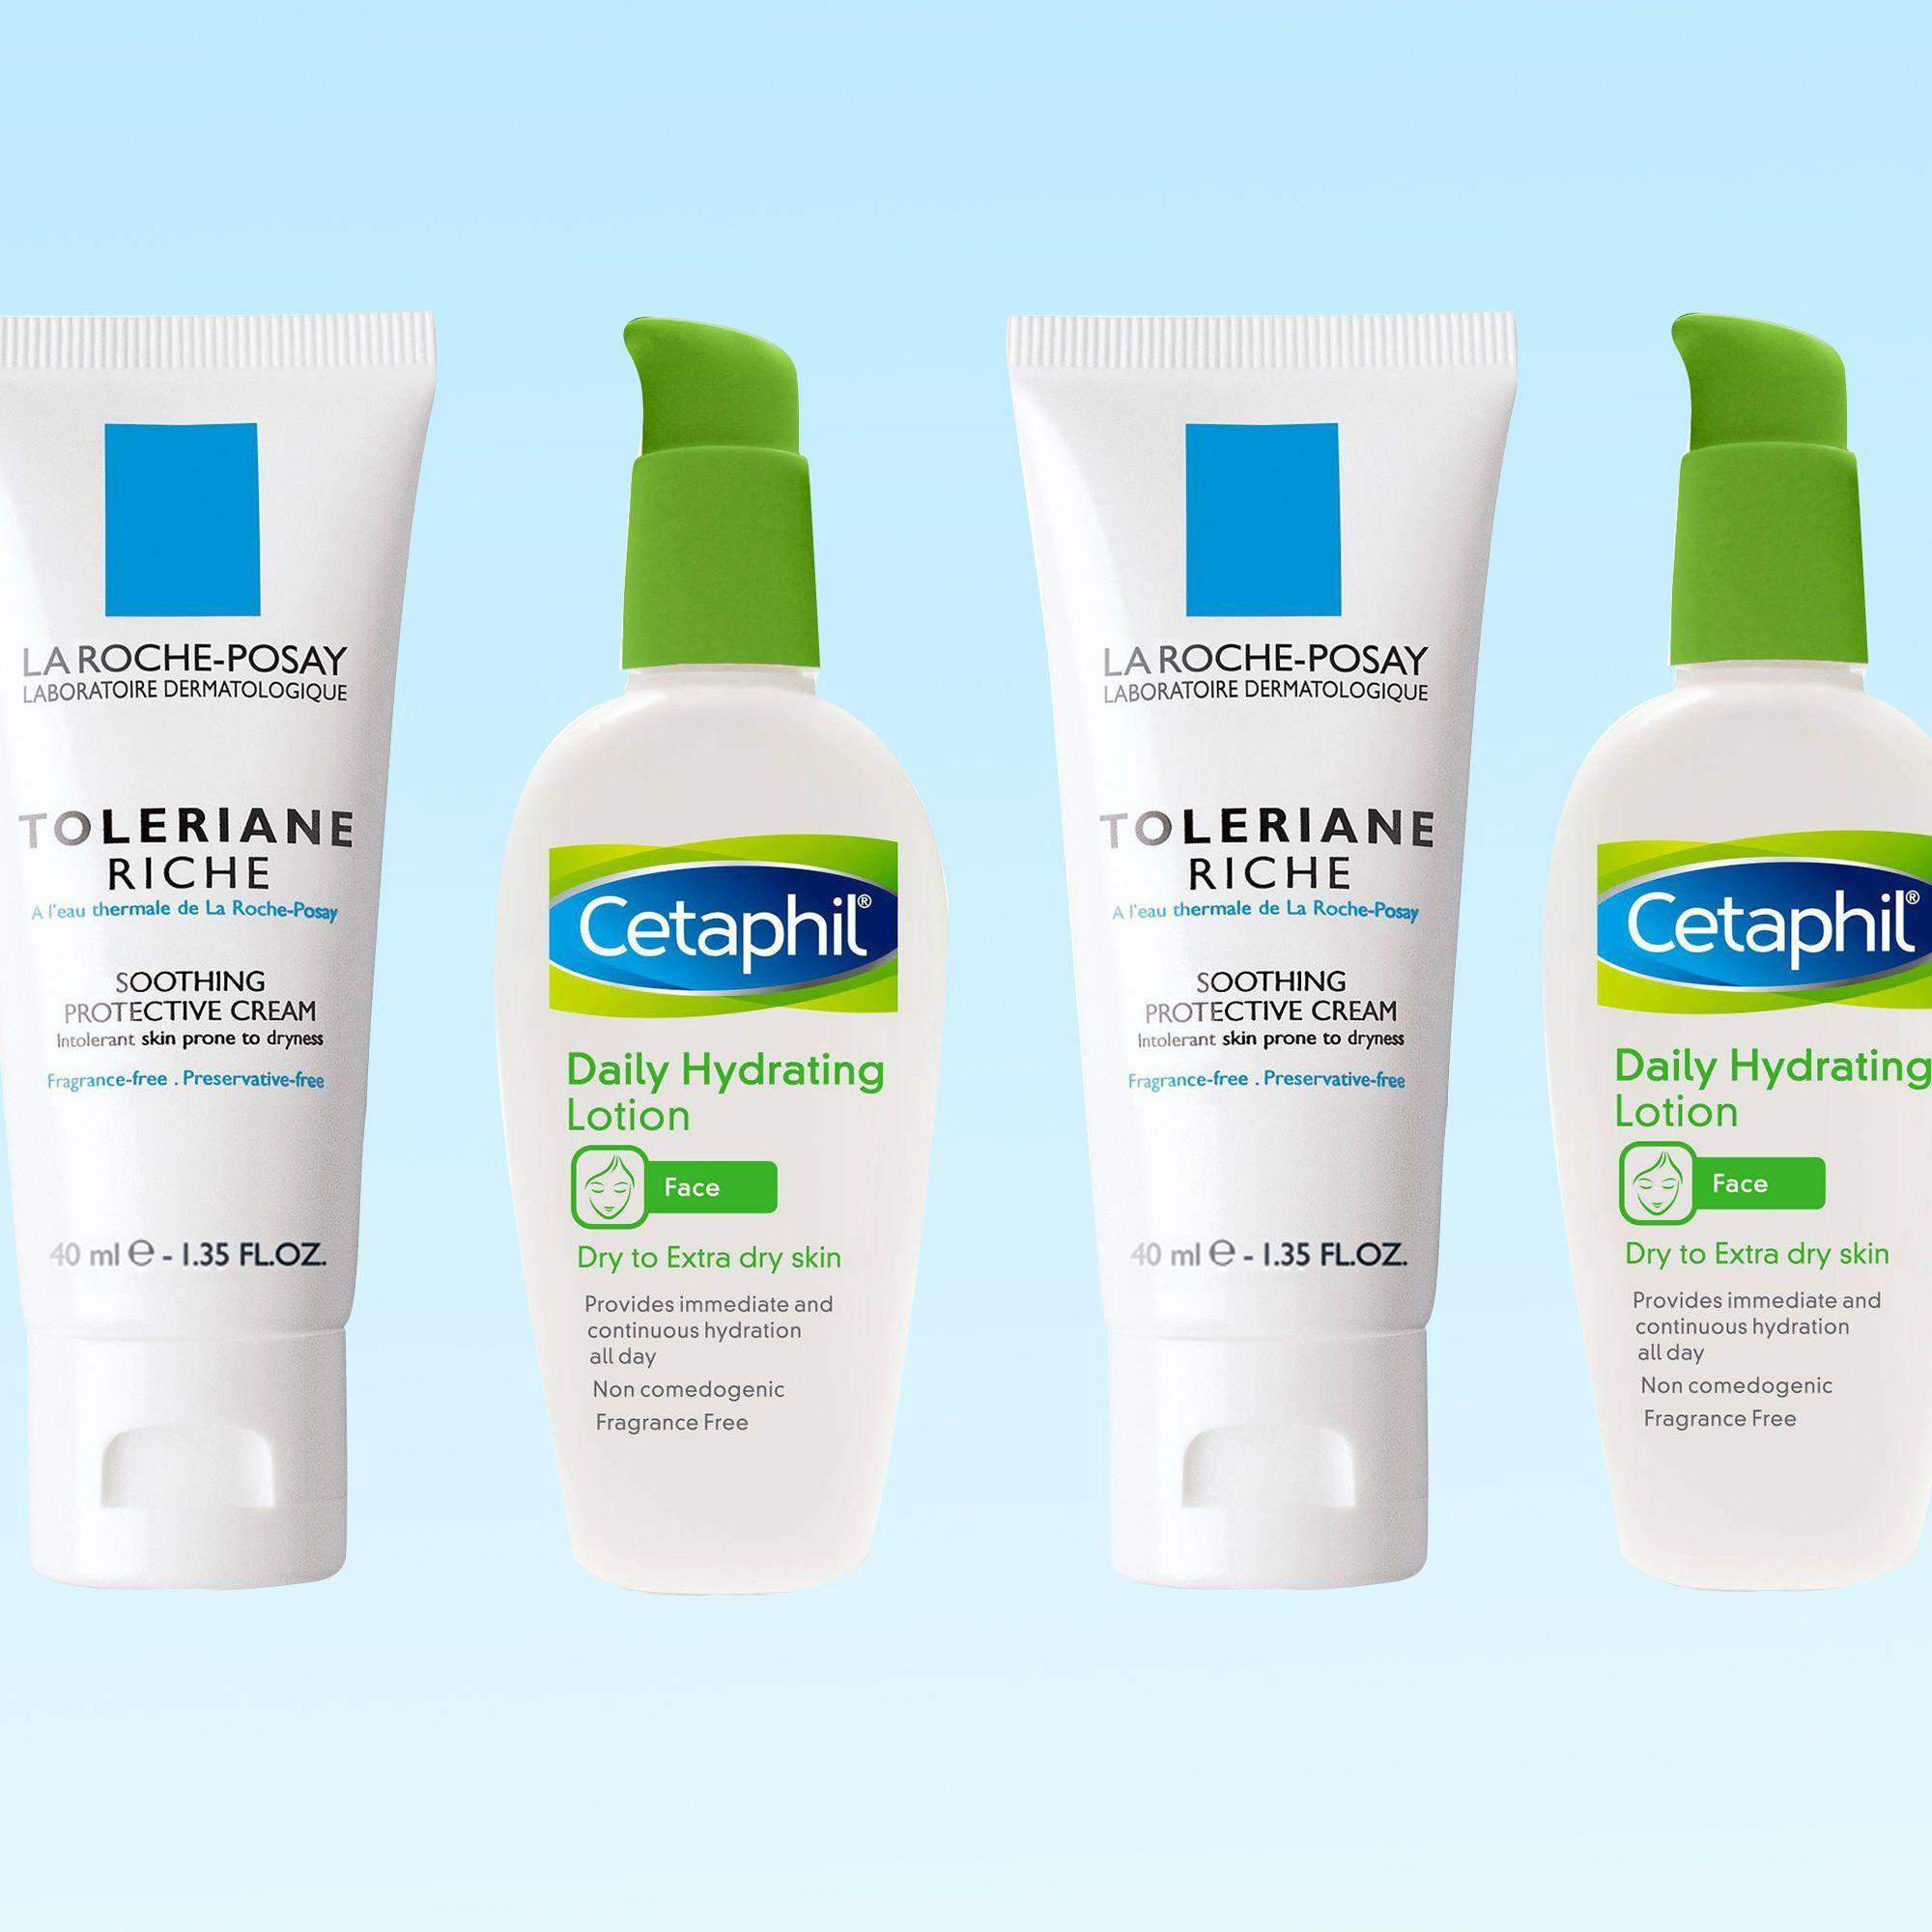 The Best Drugstore Moisturizers For Dry Skin Moisturizer For Dry Skin Best Drugstore Moisturizer Dry Skin Body